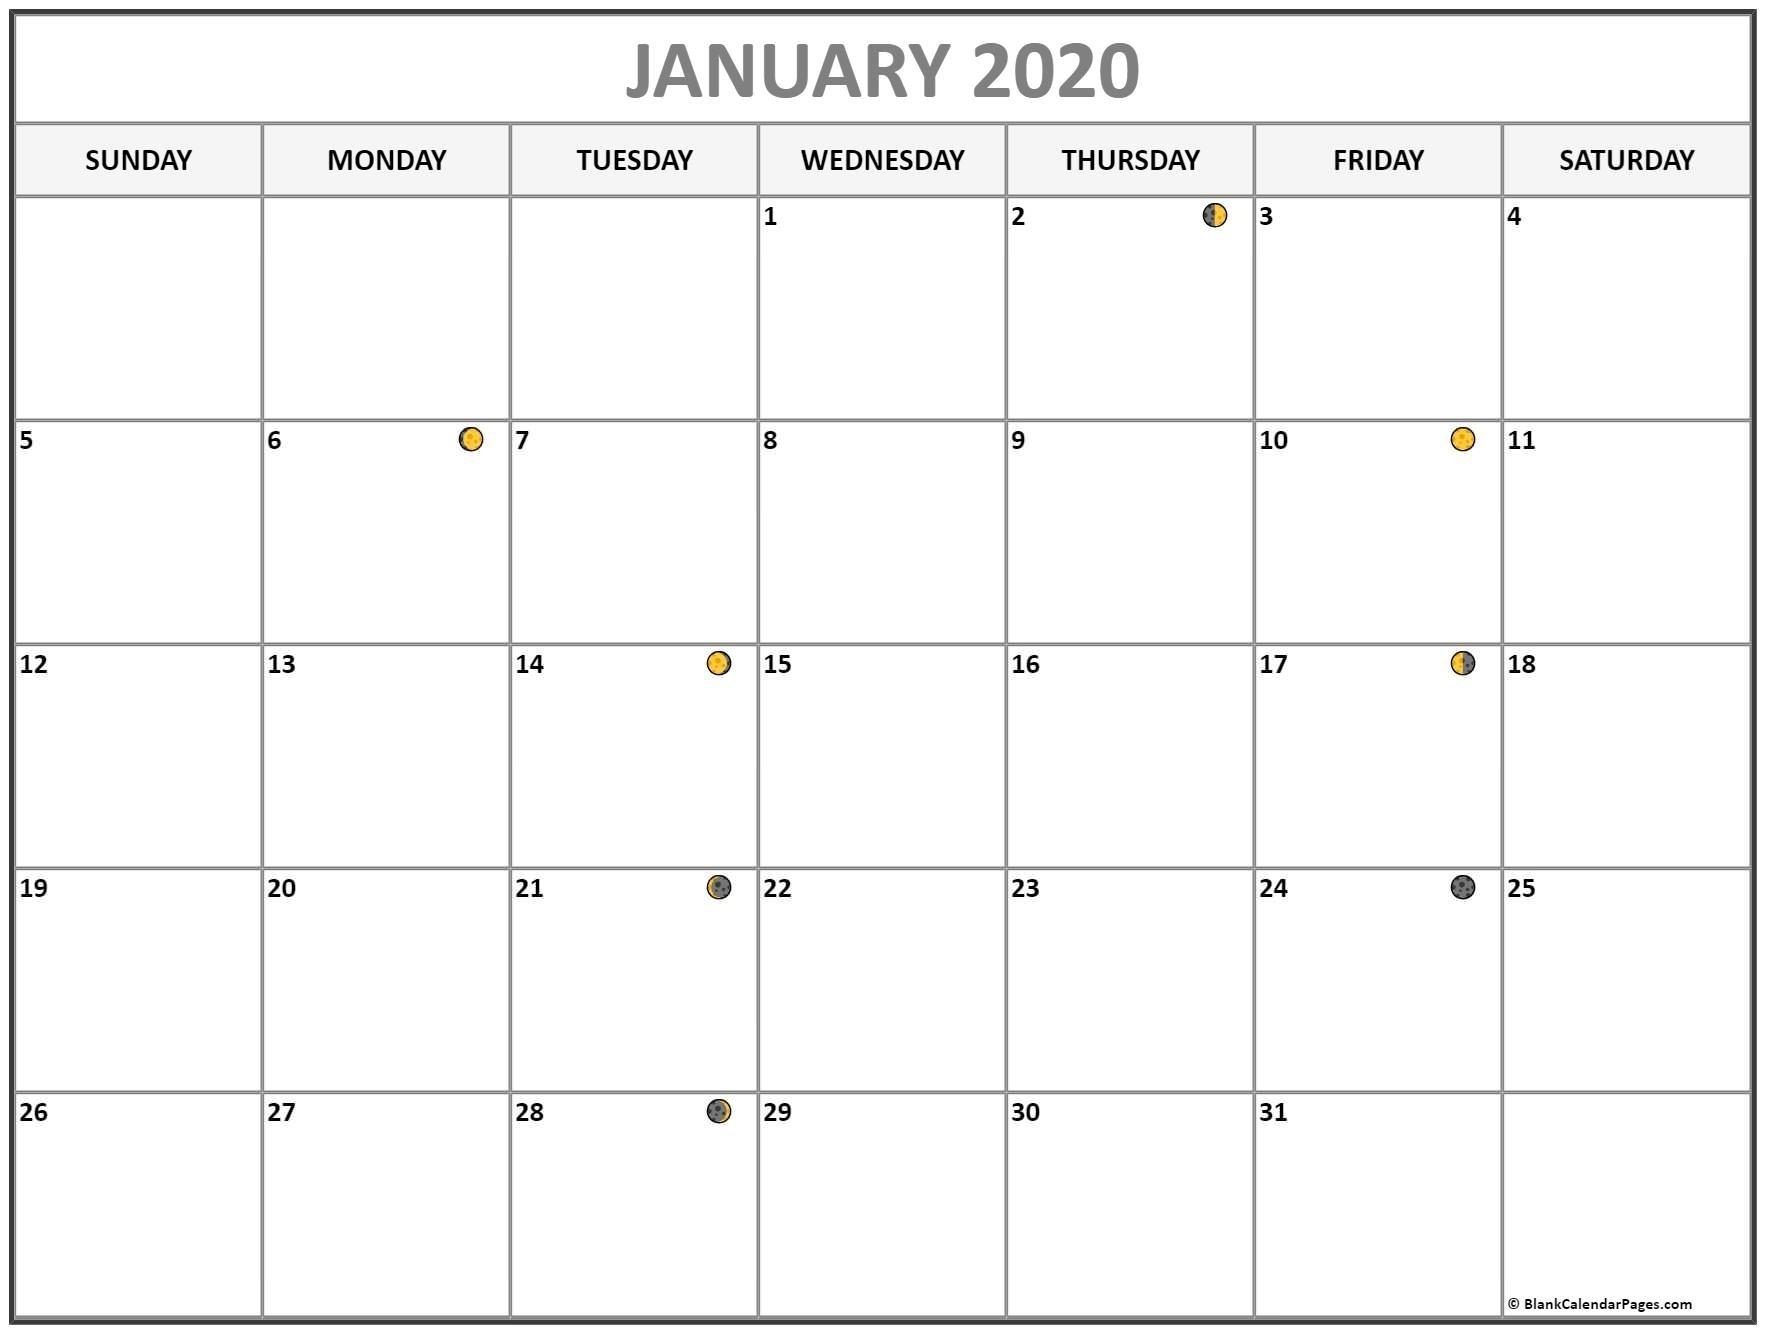 January 2020 Lunar Calendar | Moon Phase Calendar In Well-Lunar Calendar January 2020